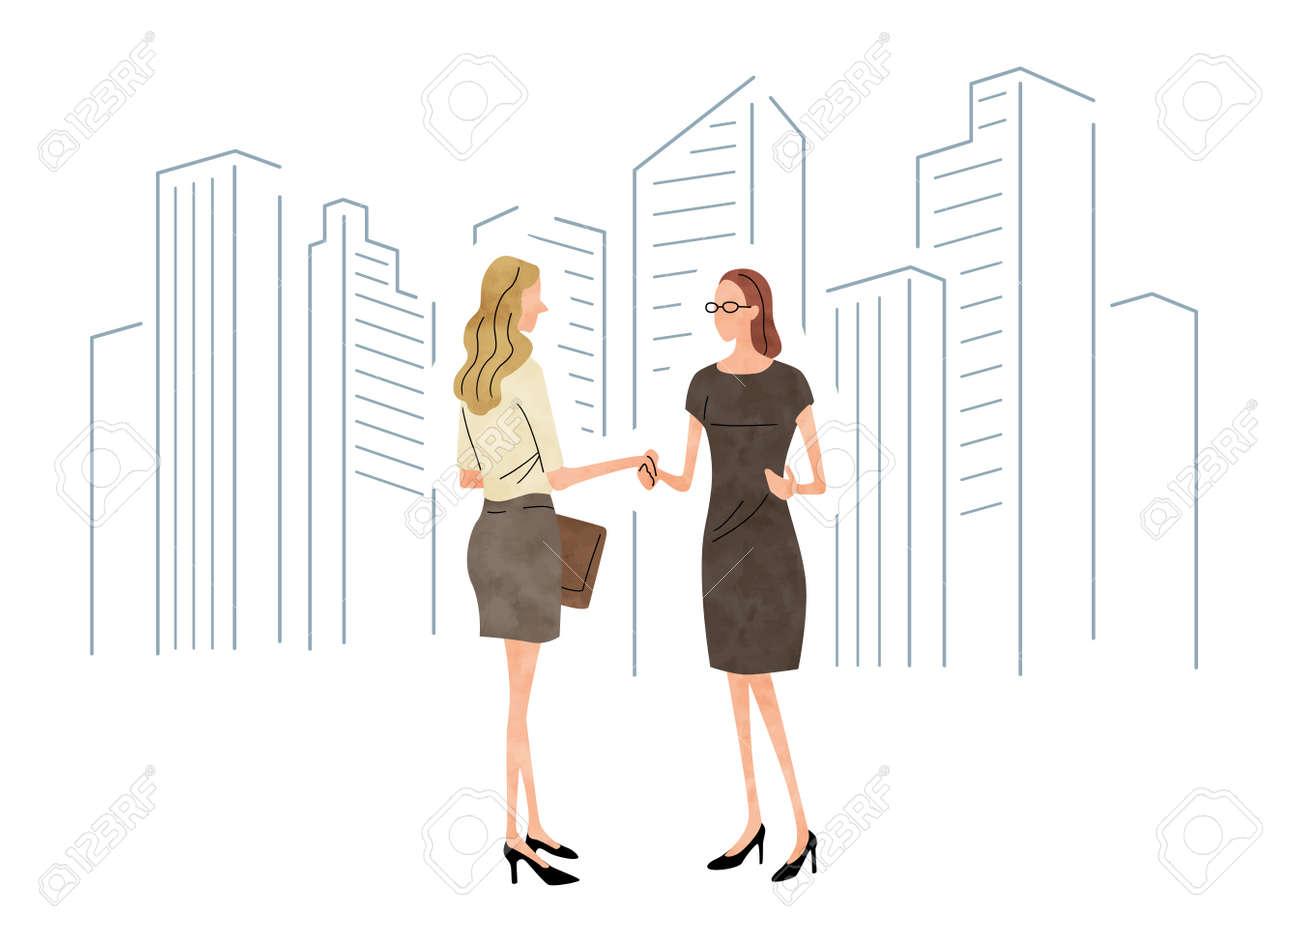 Stock Illustration: business scene, handshake, woman - 154659791